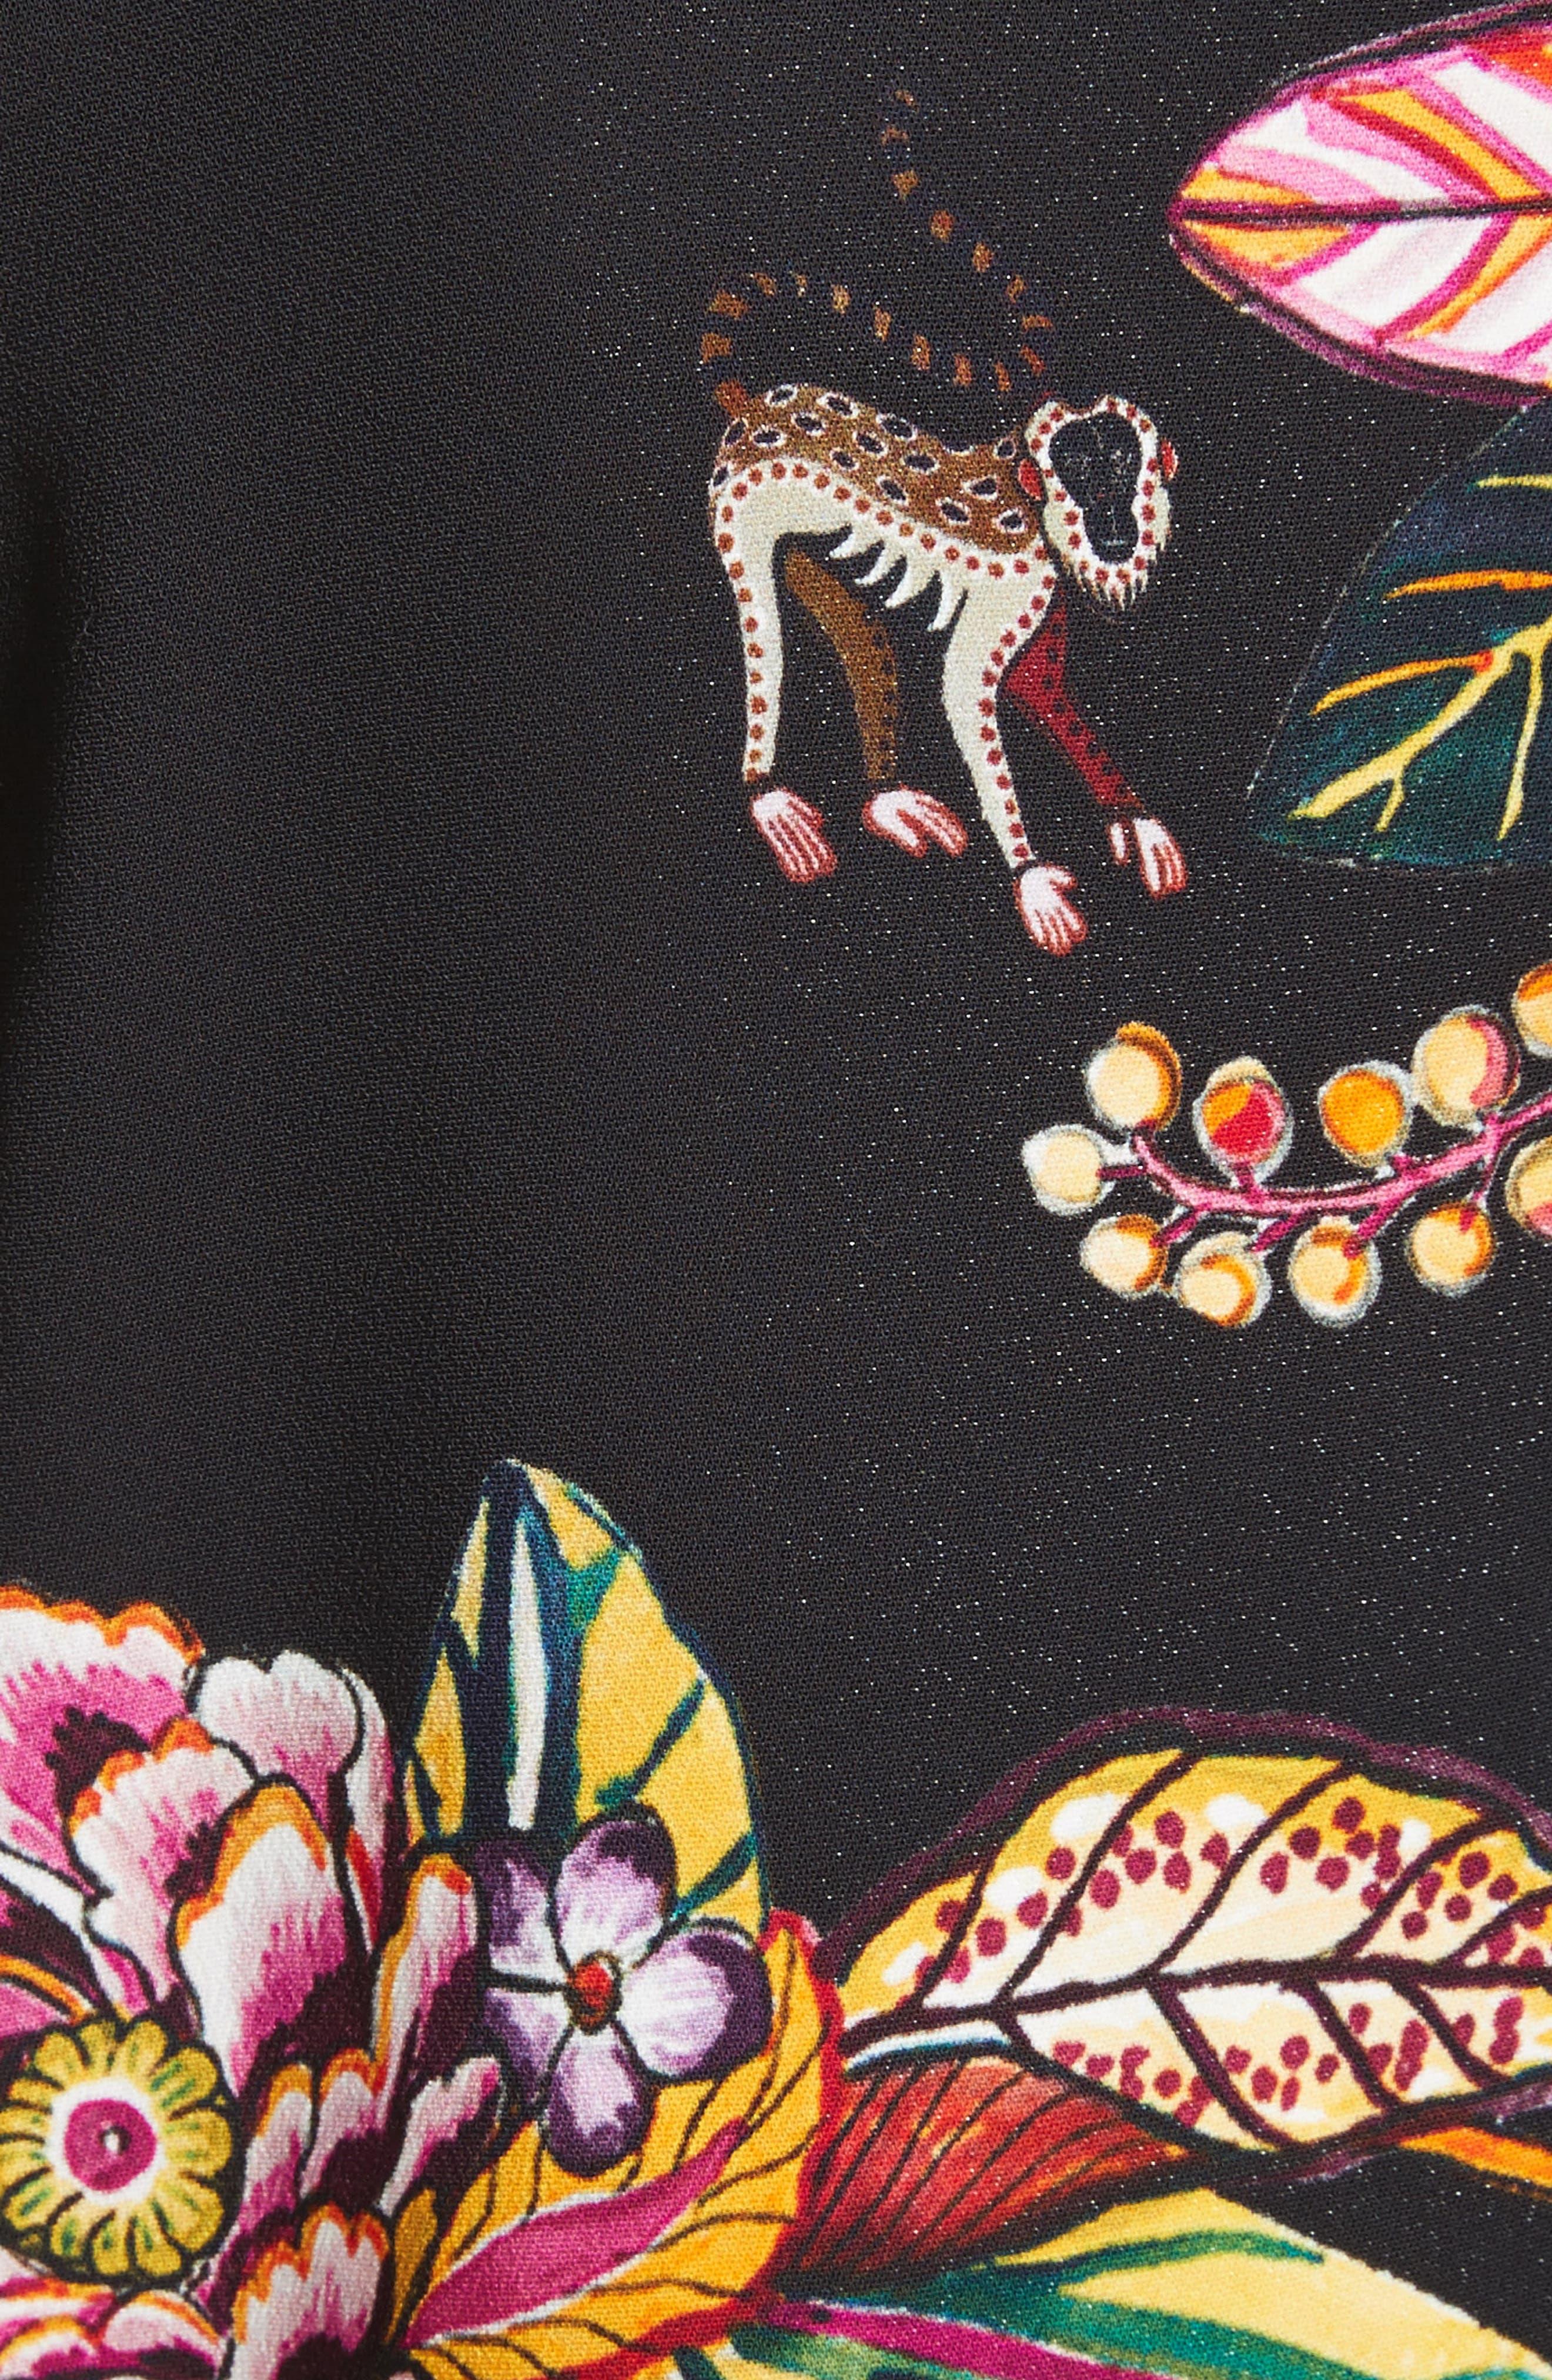 Floral Jungle & Animal Print Dress,                             Alternate thumbnail 5, color,                             001